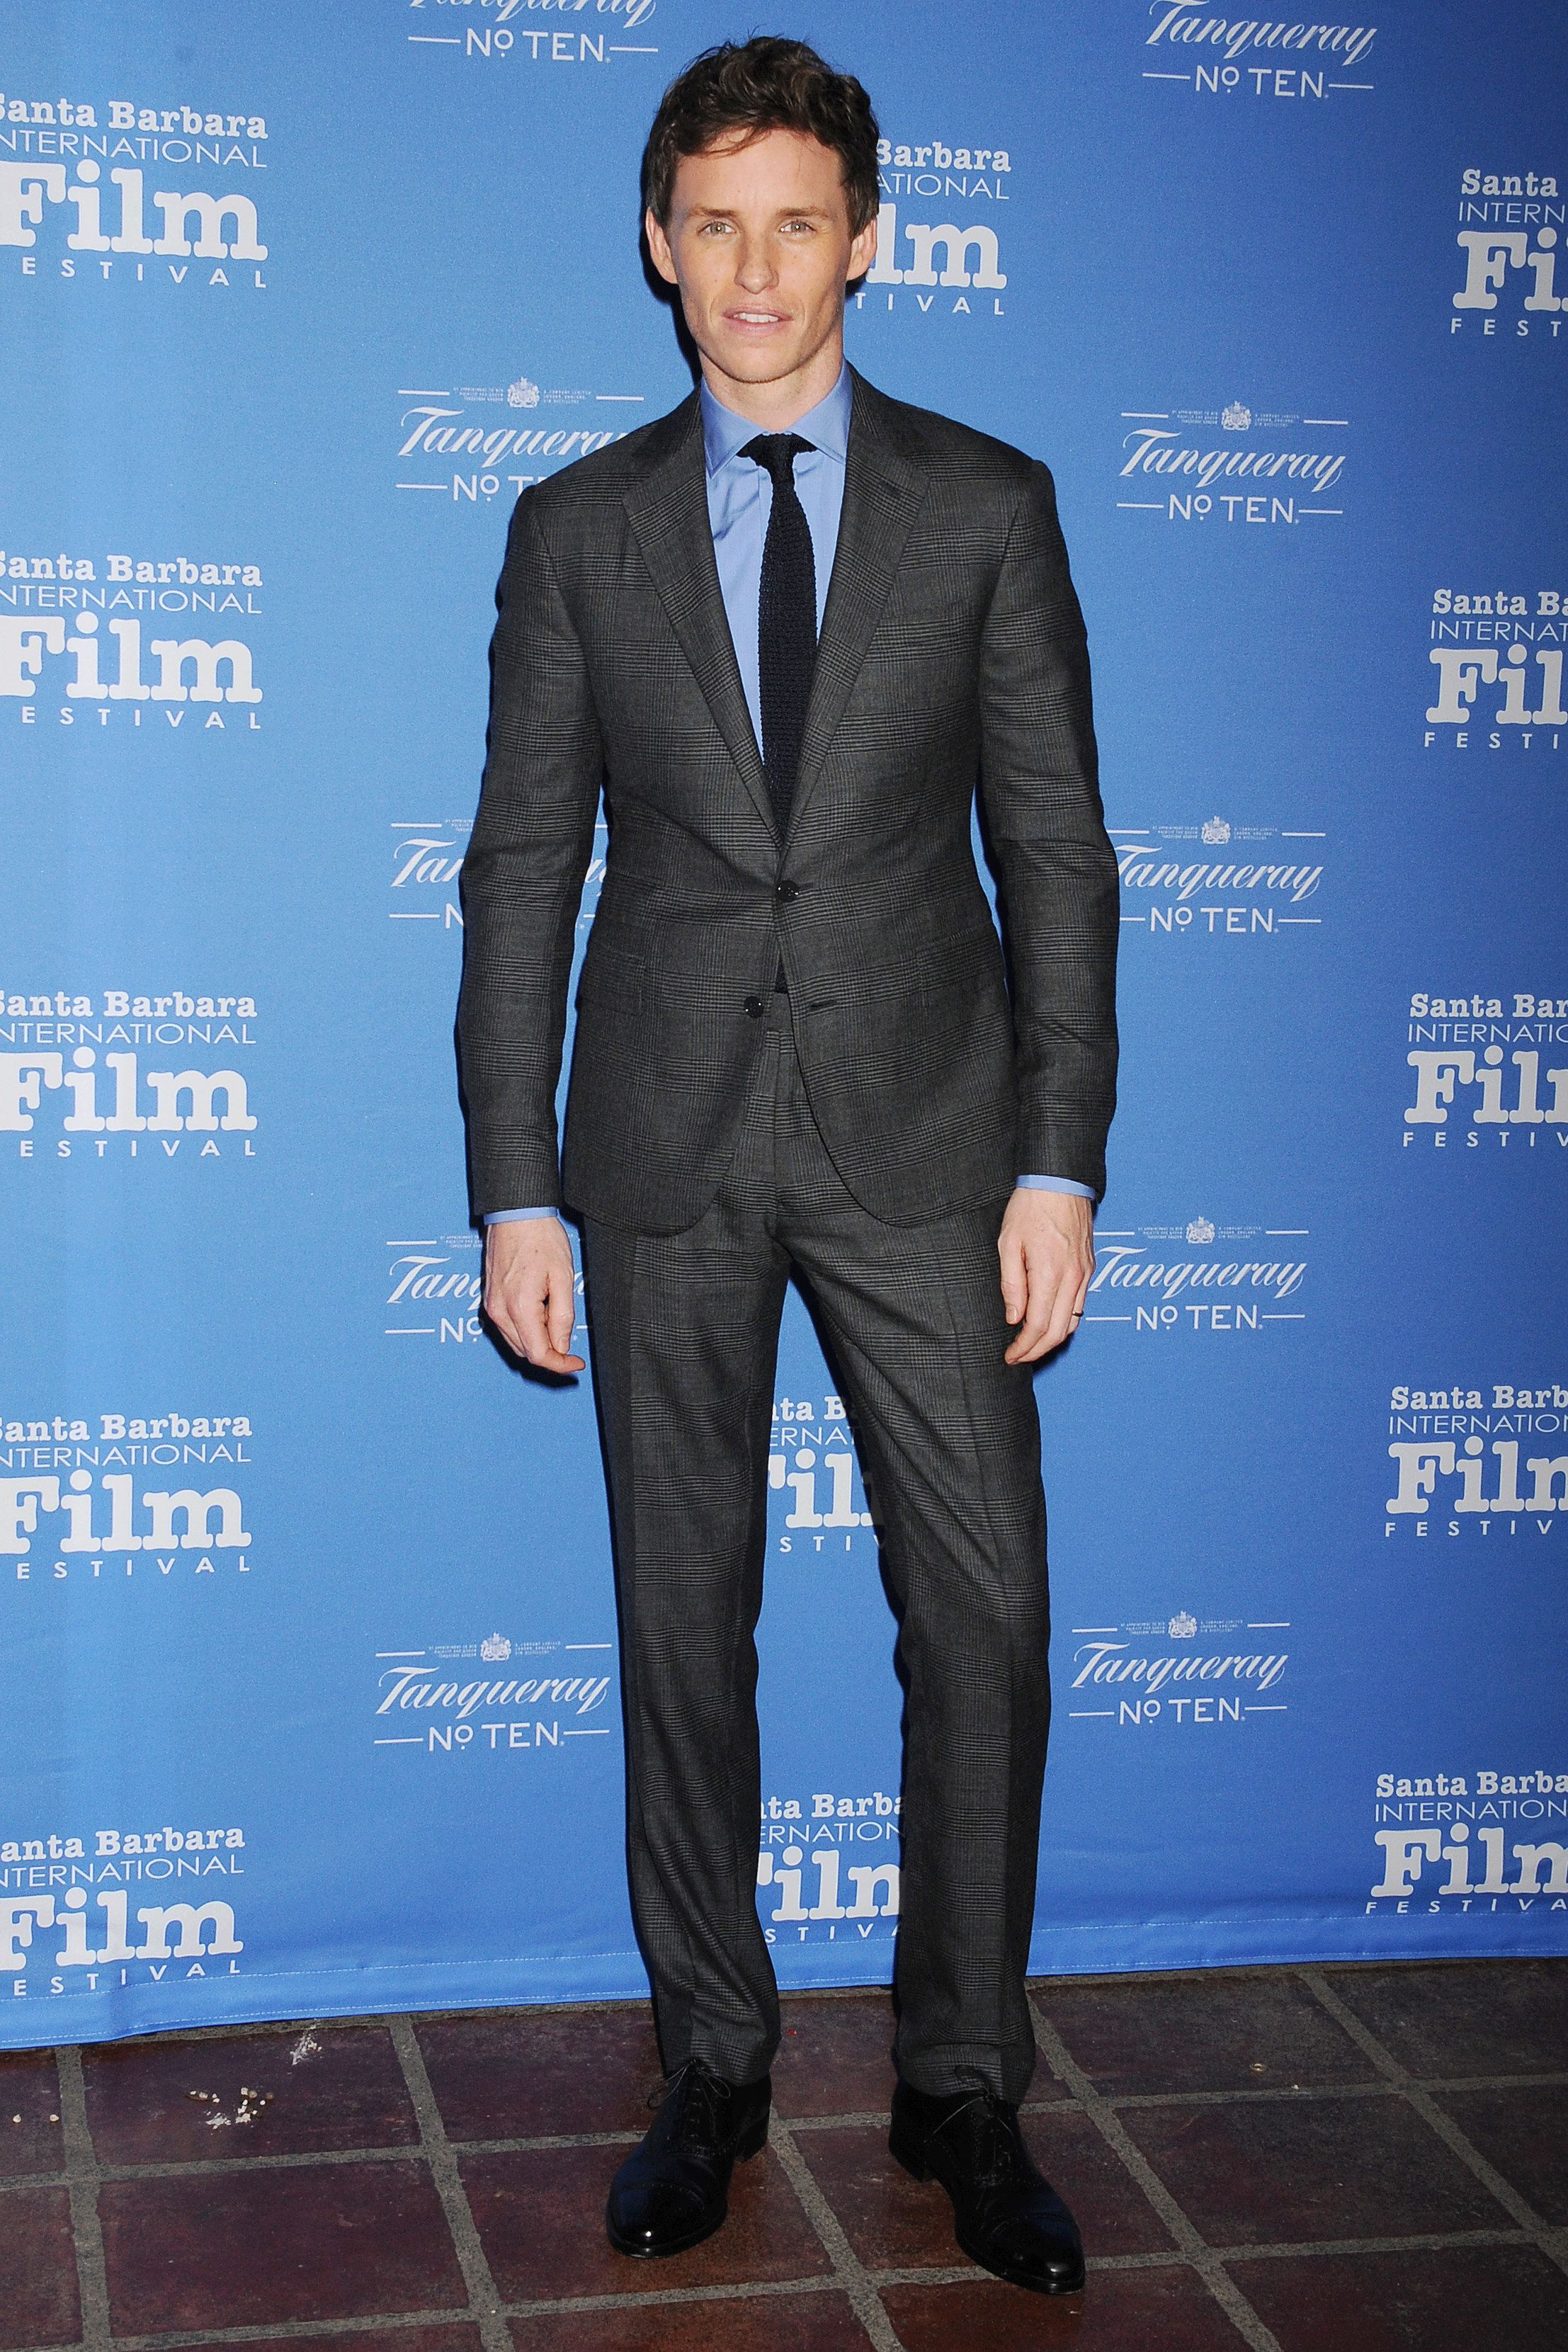 28 Times Eddie Redmayne Inspired Us To Wear a Suit | Pinterest ...